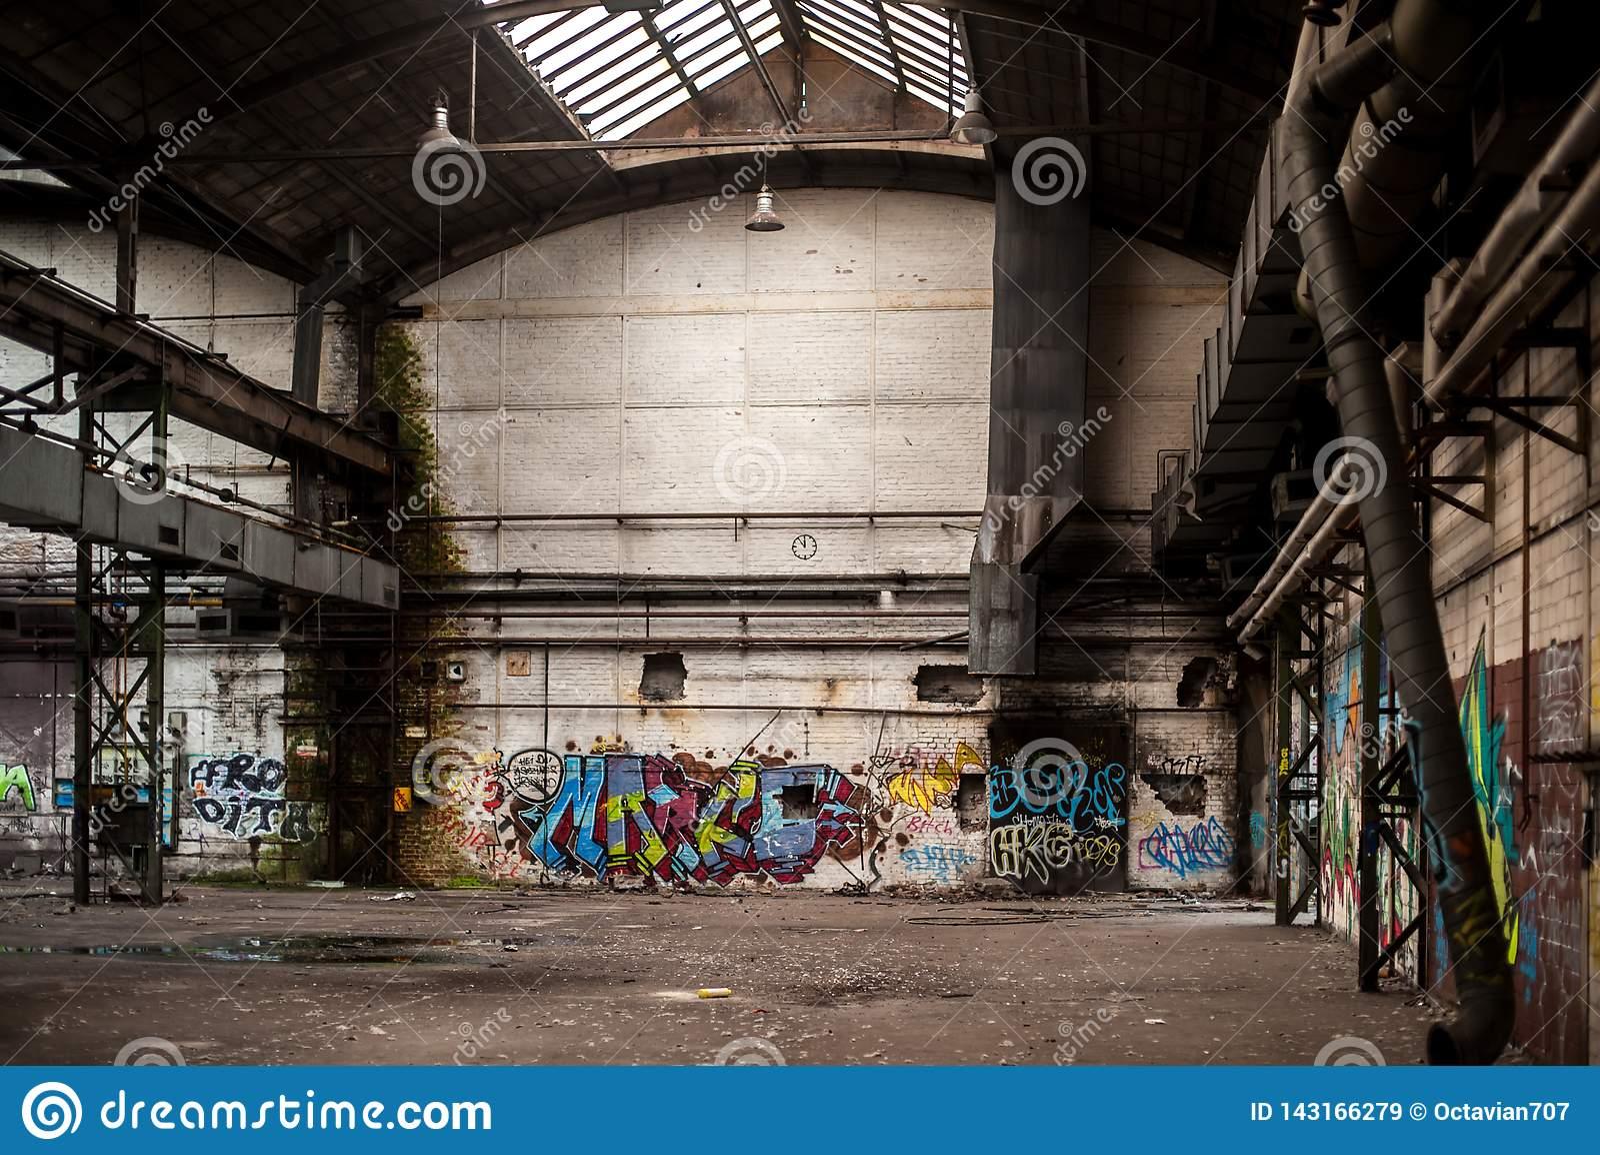 Binnen de oude en verlaten fabrieksbouw met graffiti